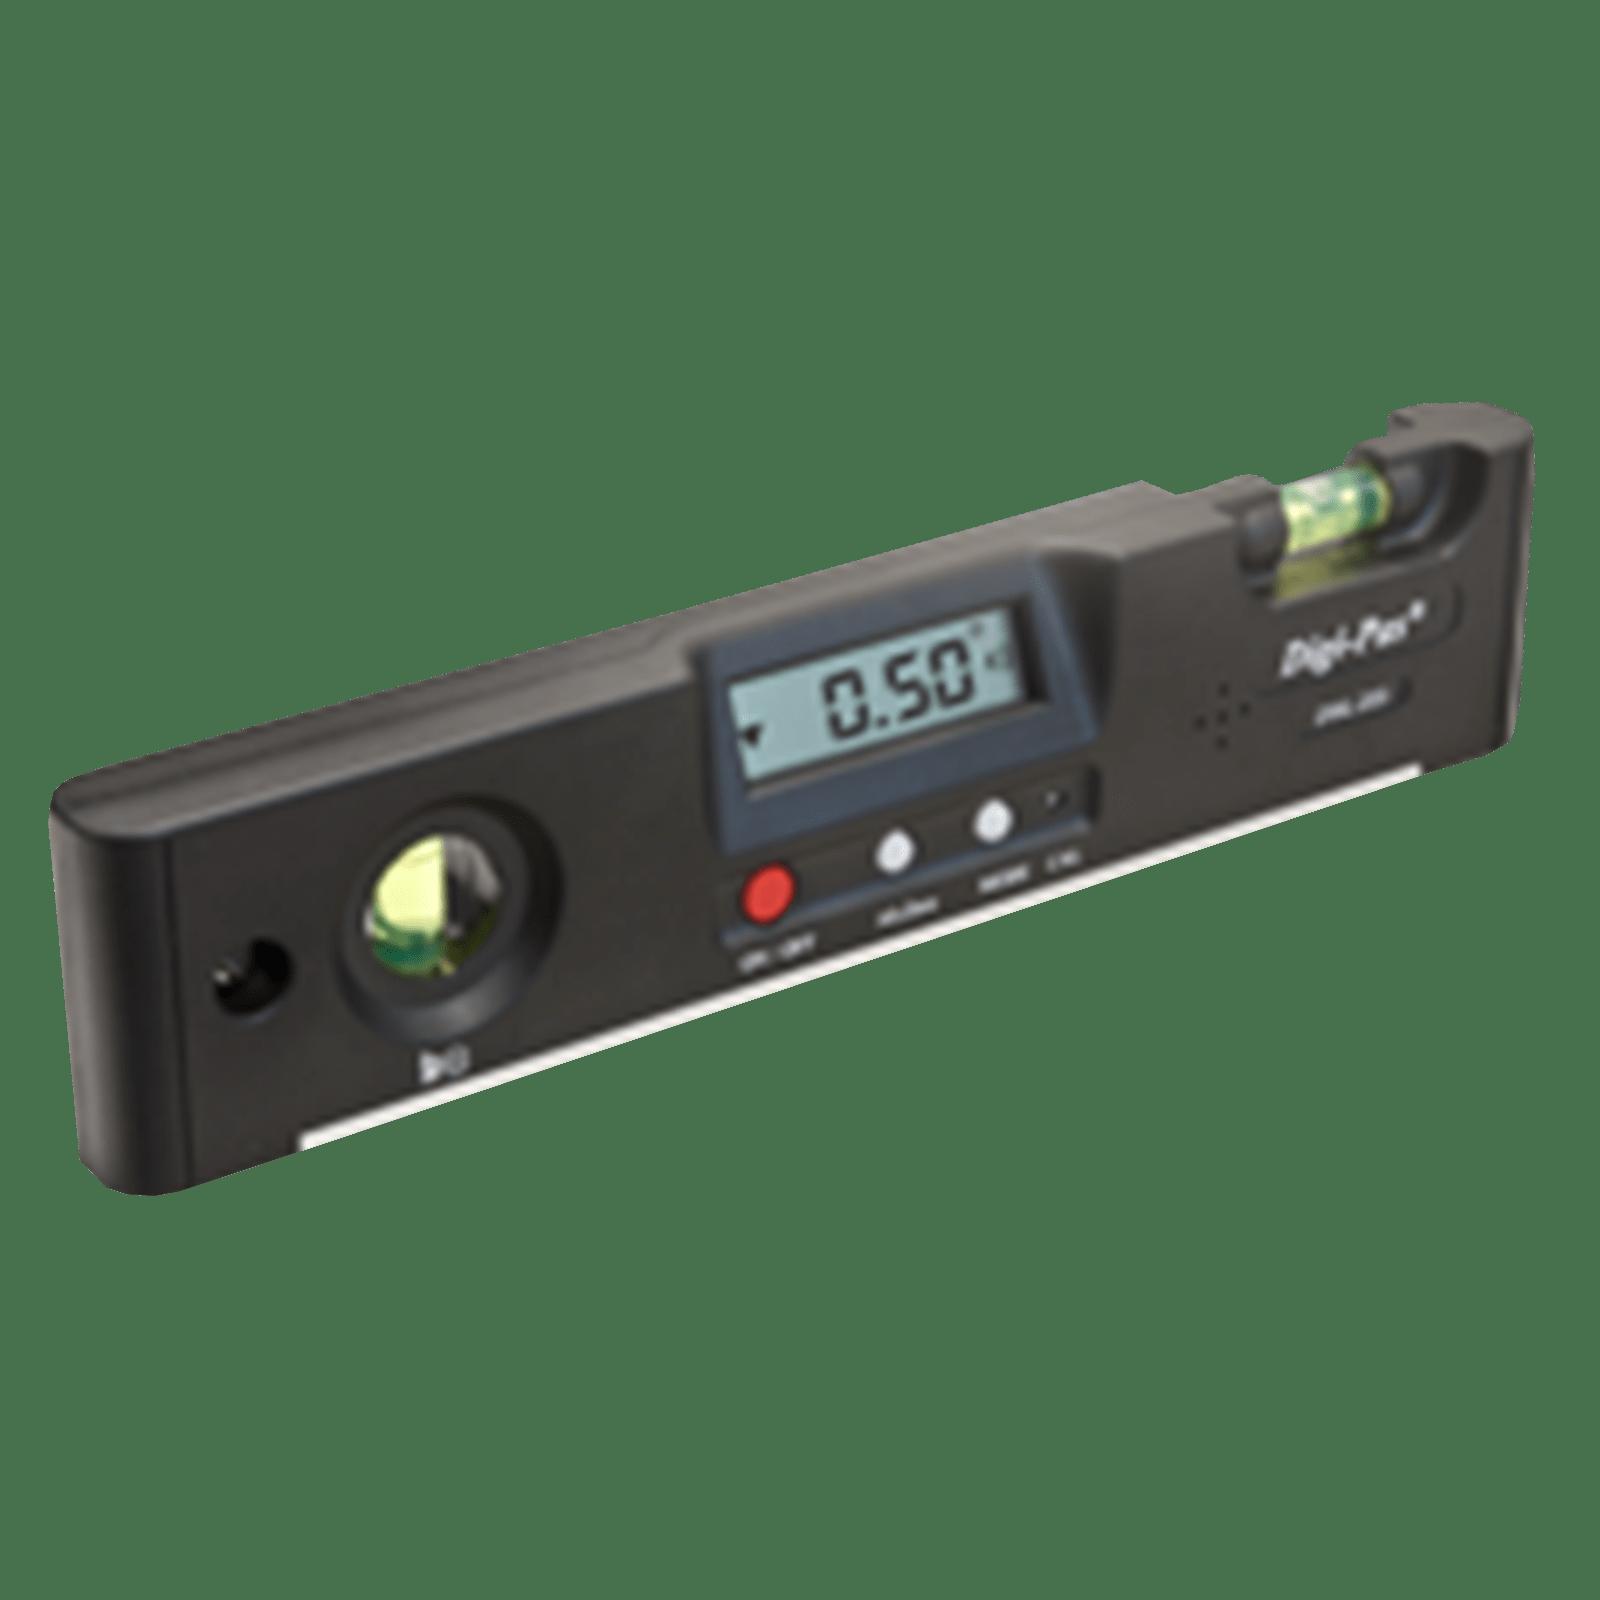 Digi-Pas DWL 200 digitale Wasserwaage